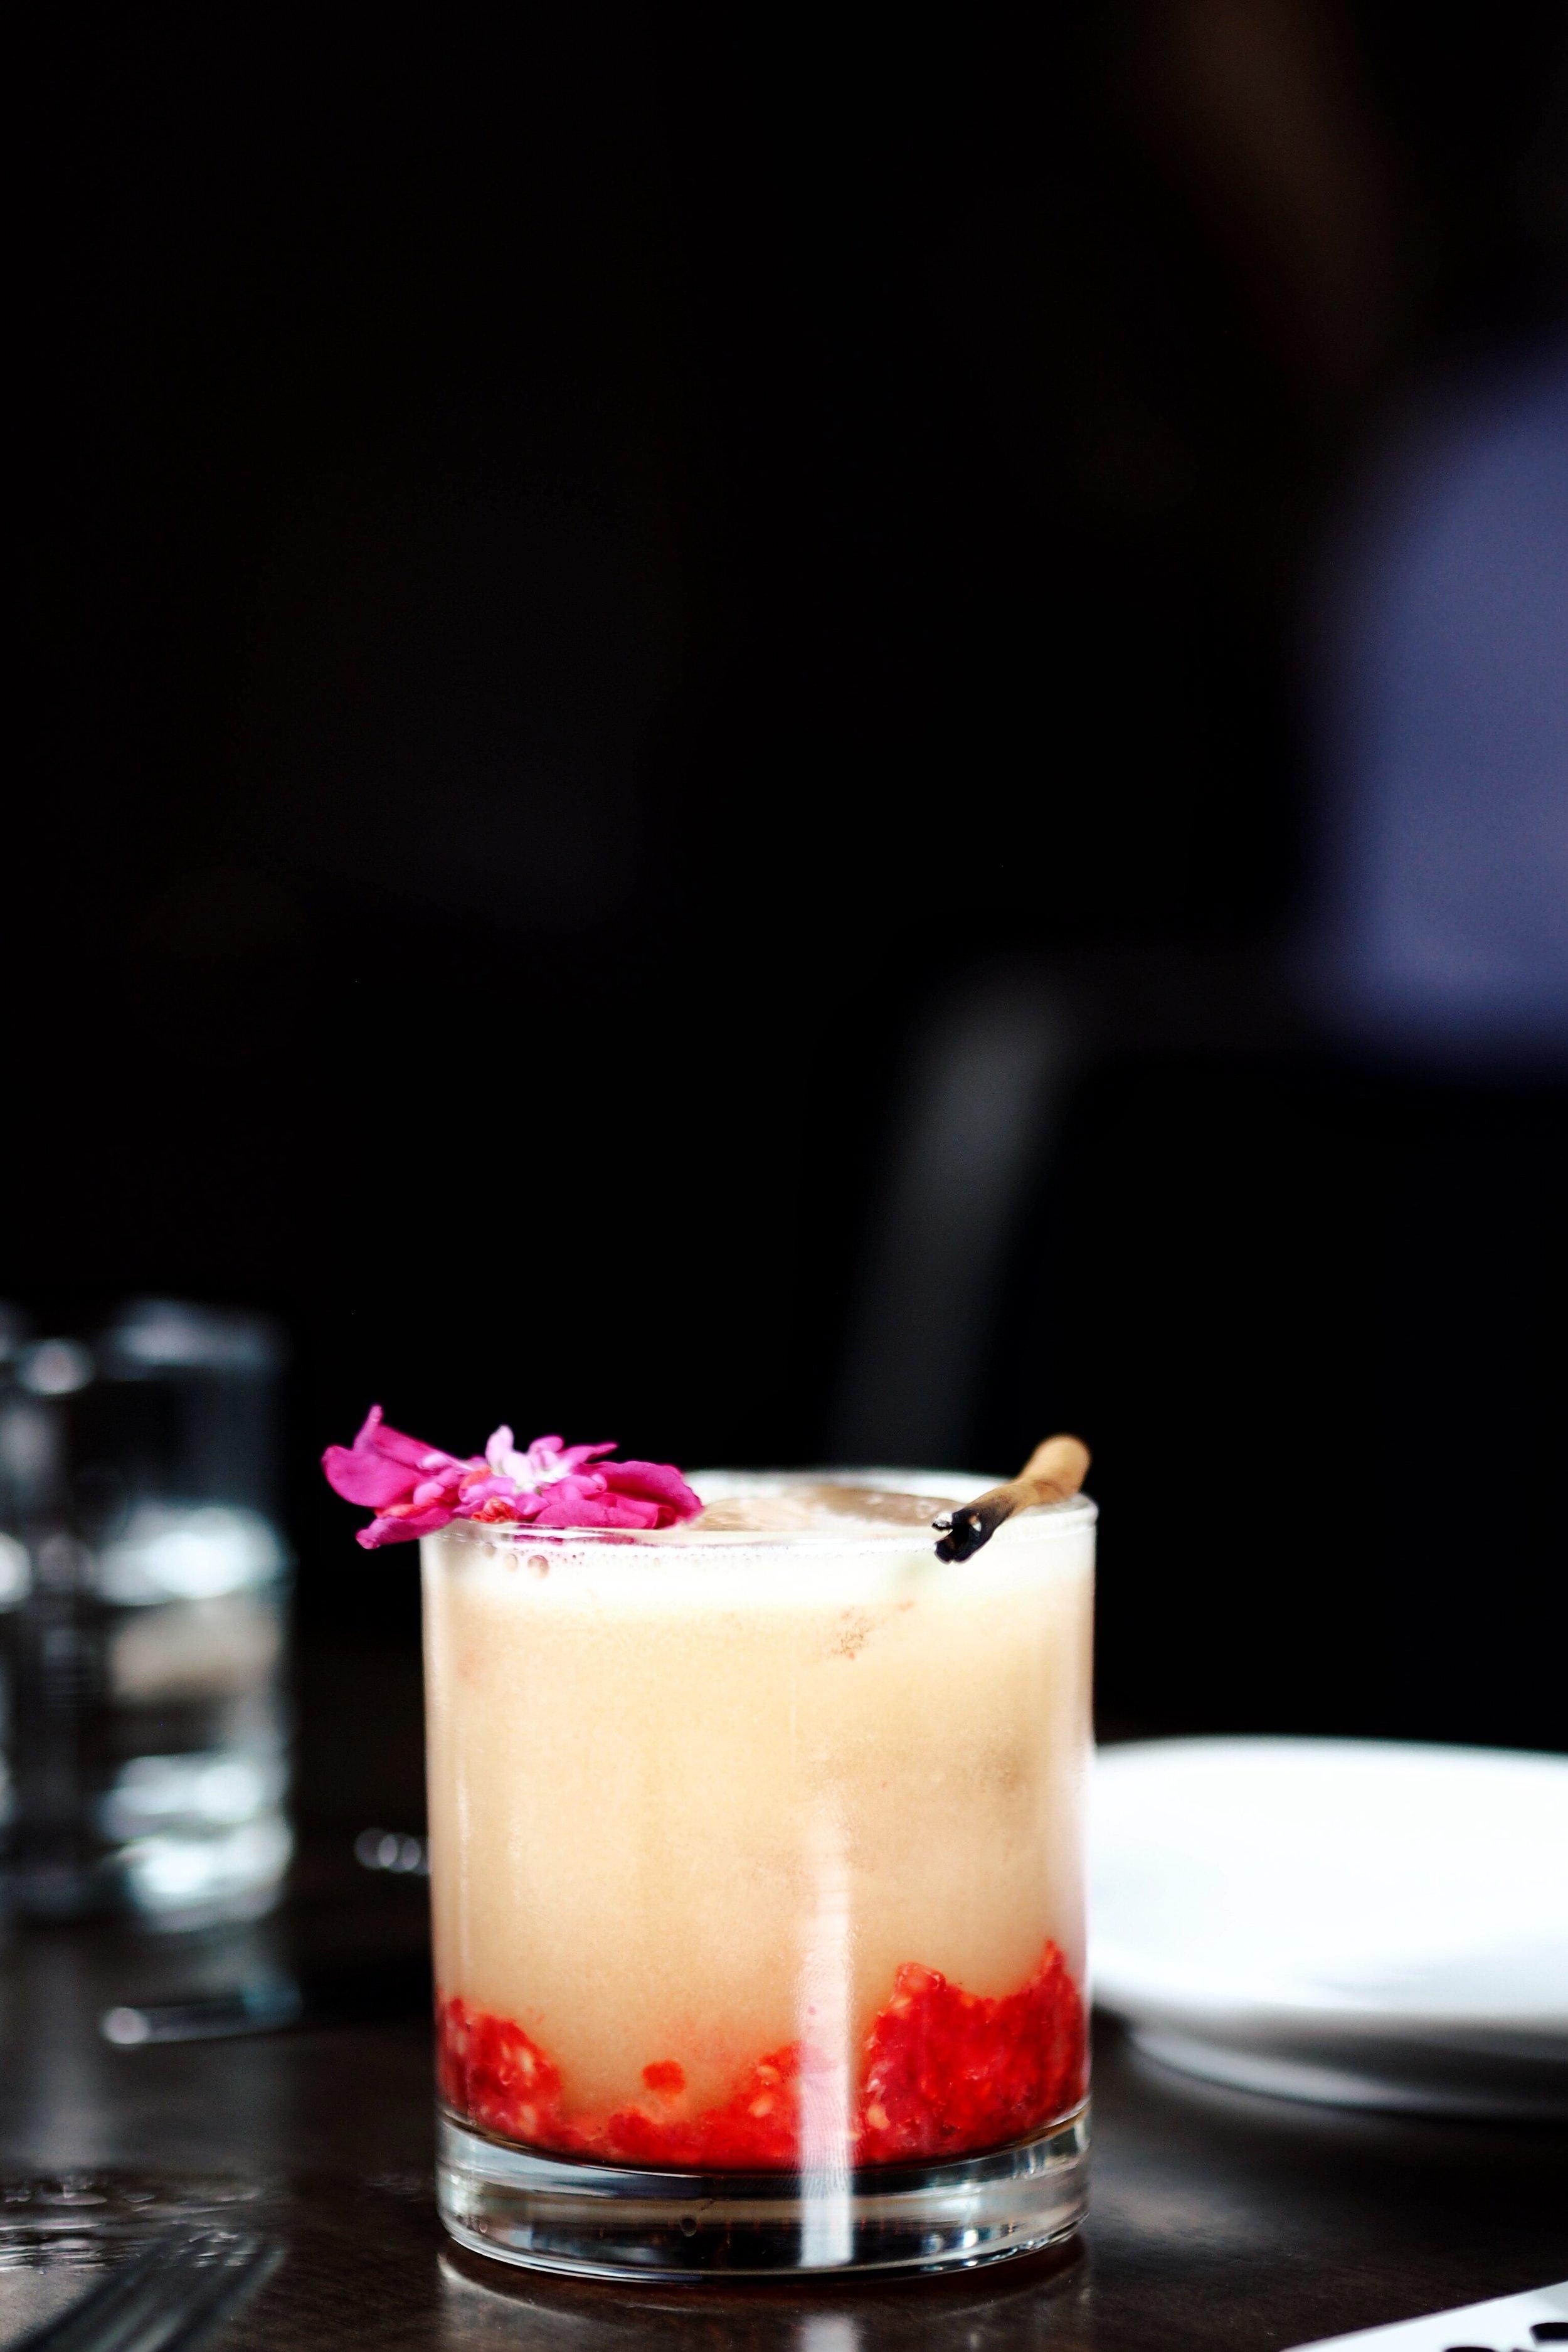 Bramble Bee : Havana Club 7 Años, Cazadores Blanco, Lime Juice, Passion Fruit Juice, Pineapple Juice, Falernum, Raspberries ($19.00 + tax)